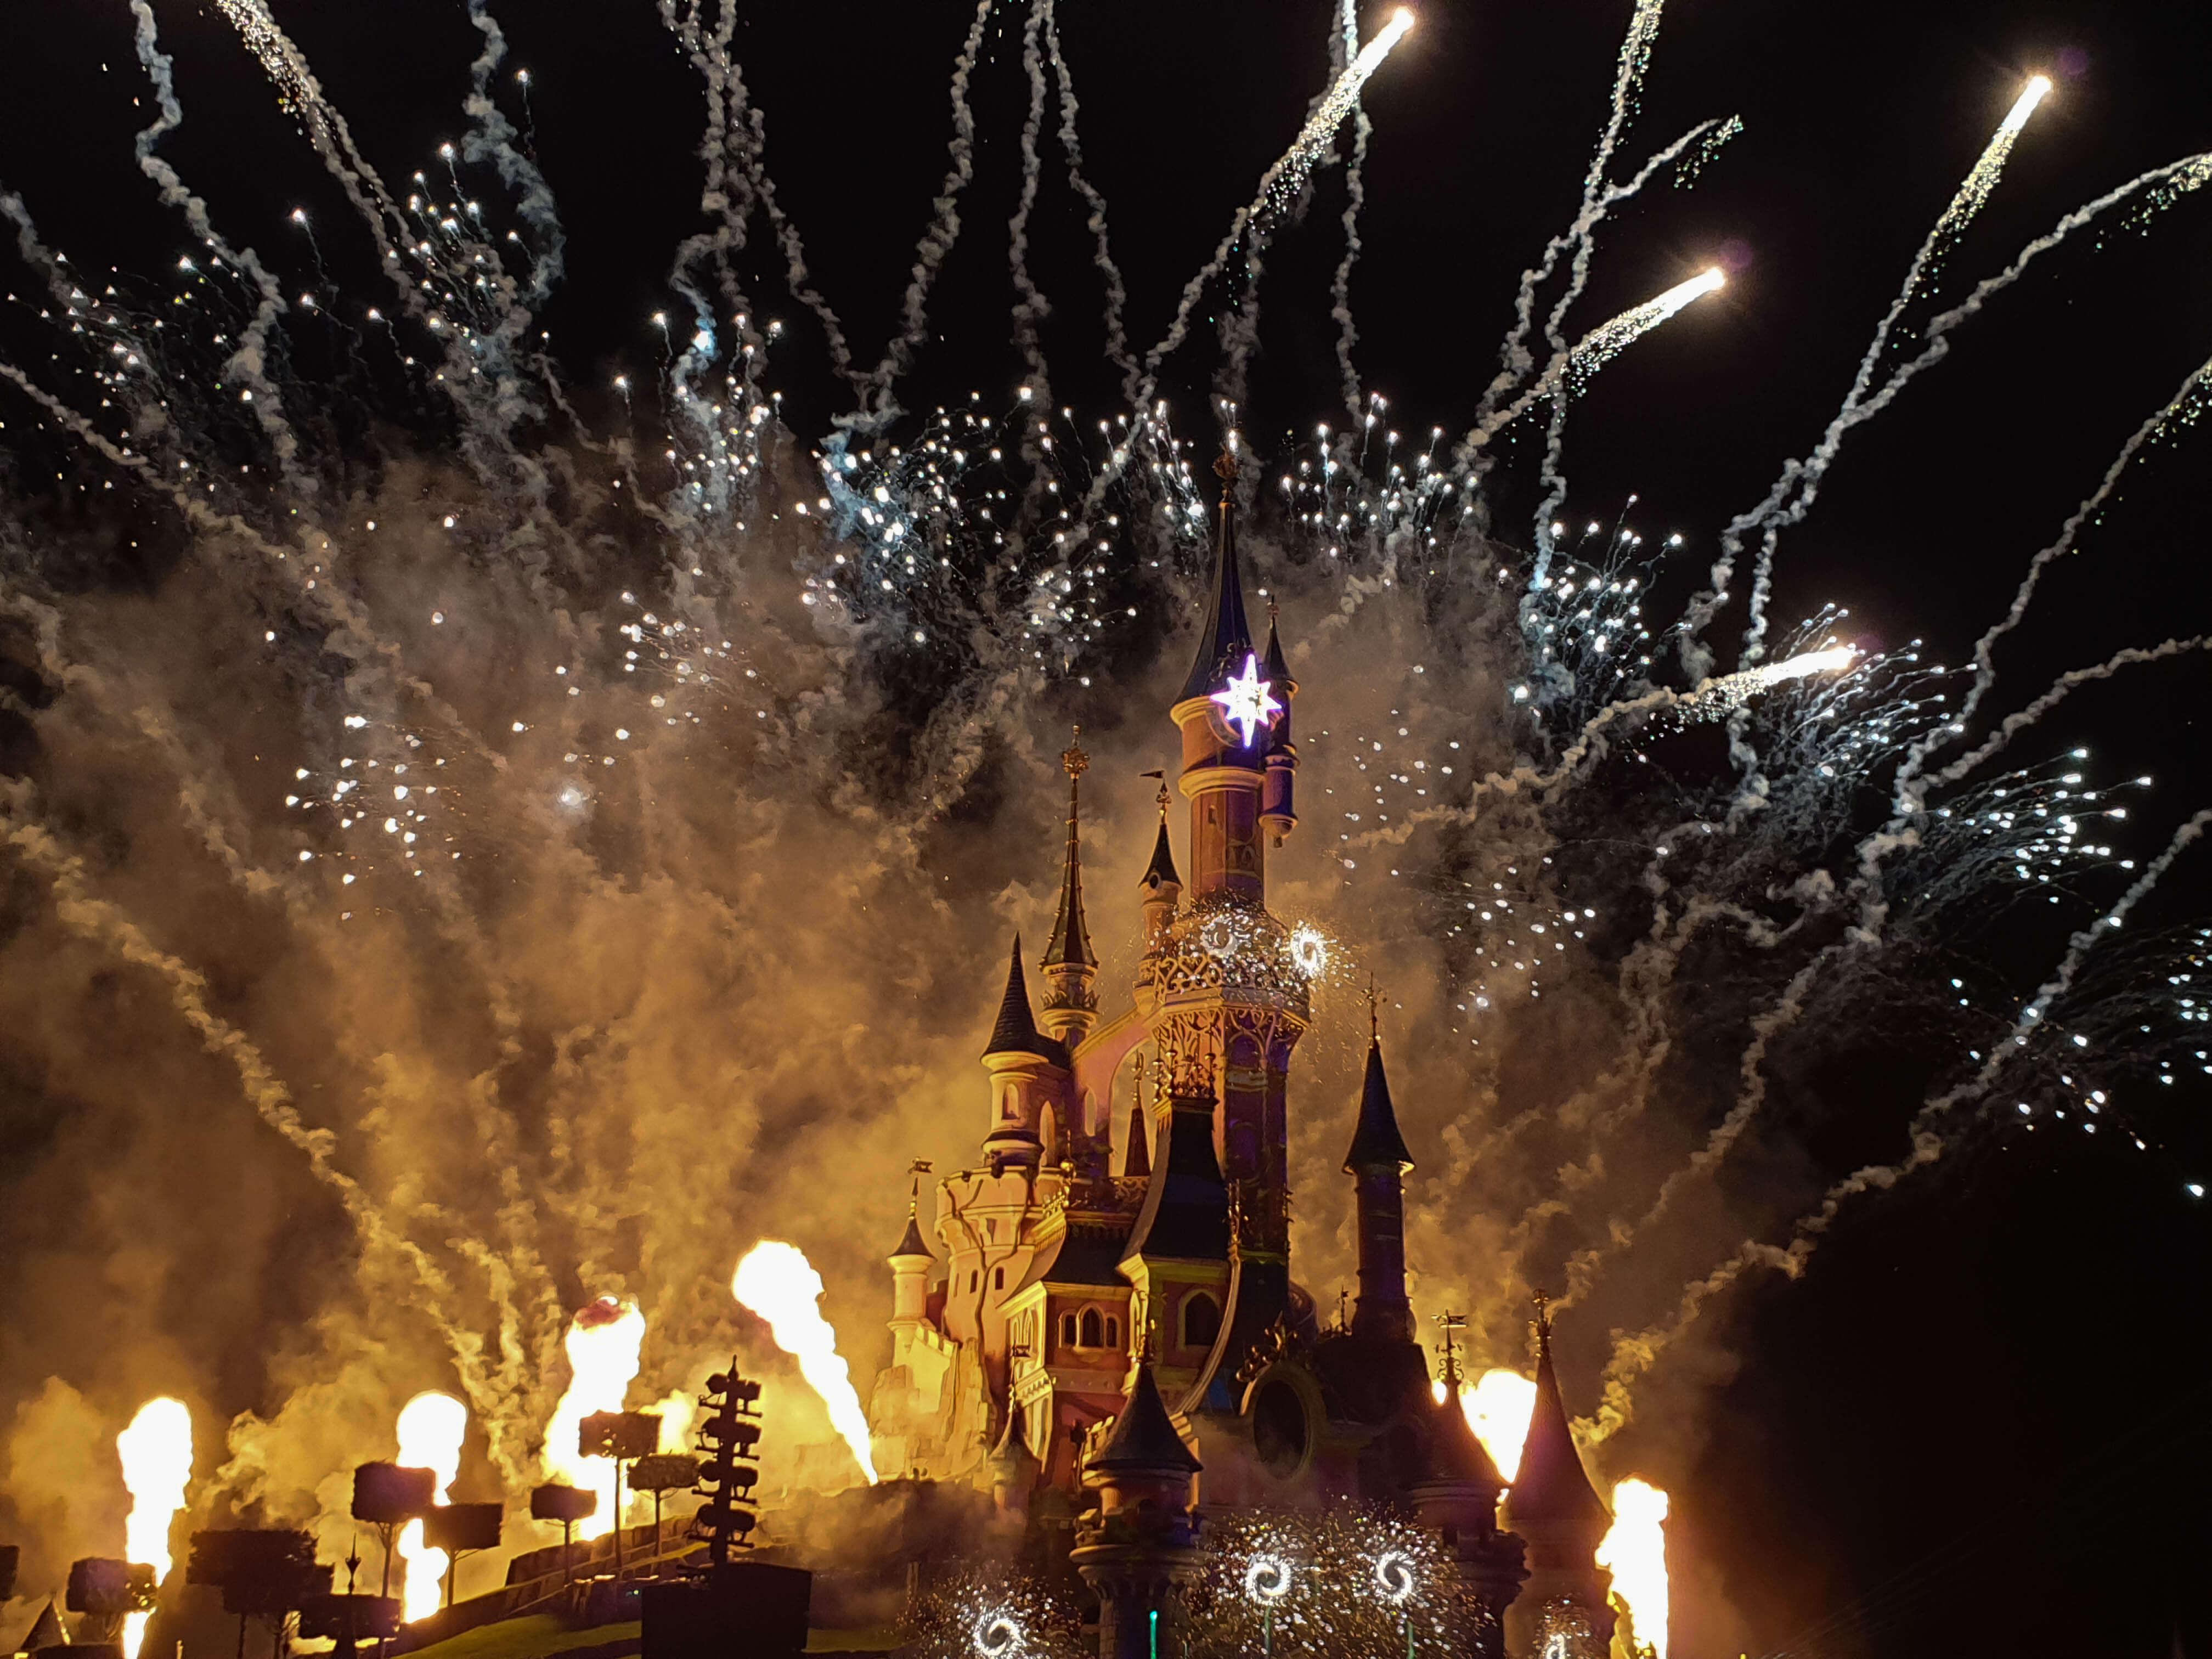 Vuurwerkfestival in Disneyland Parijs